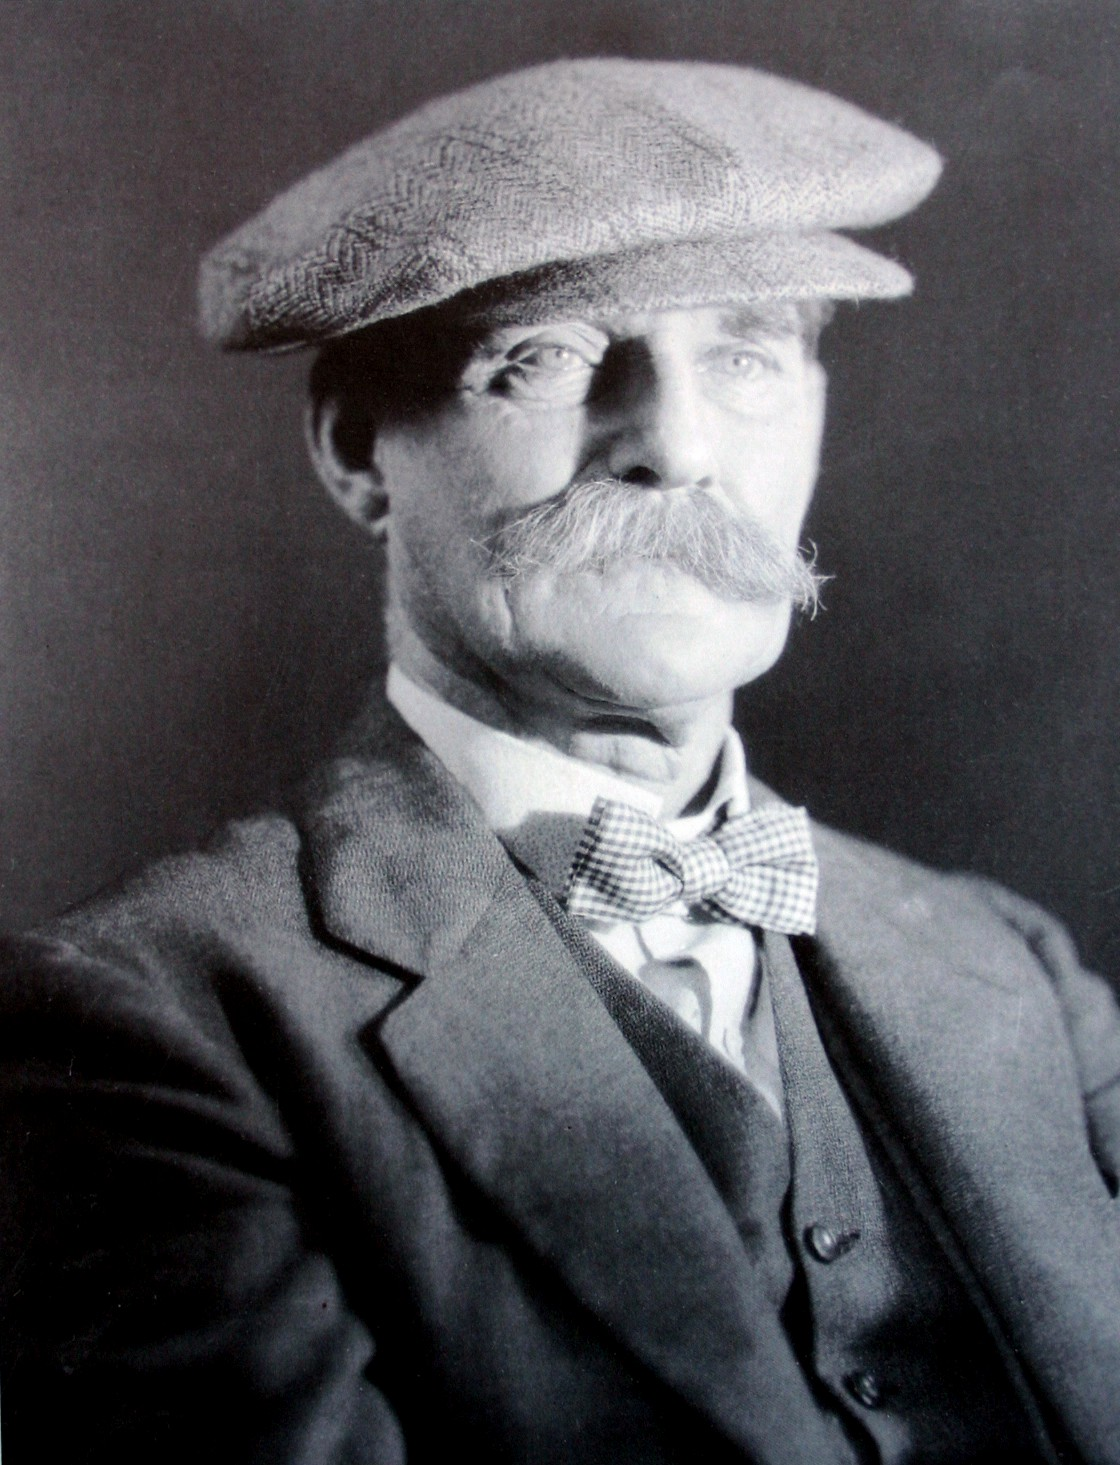 Image of Arthur Elliott from Wikidata